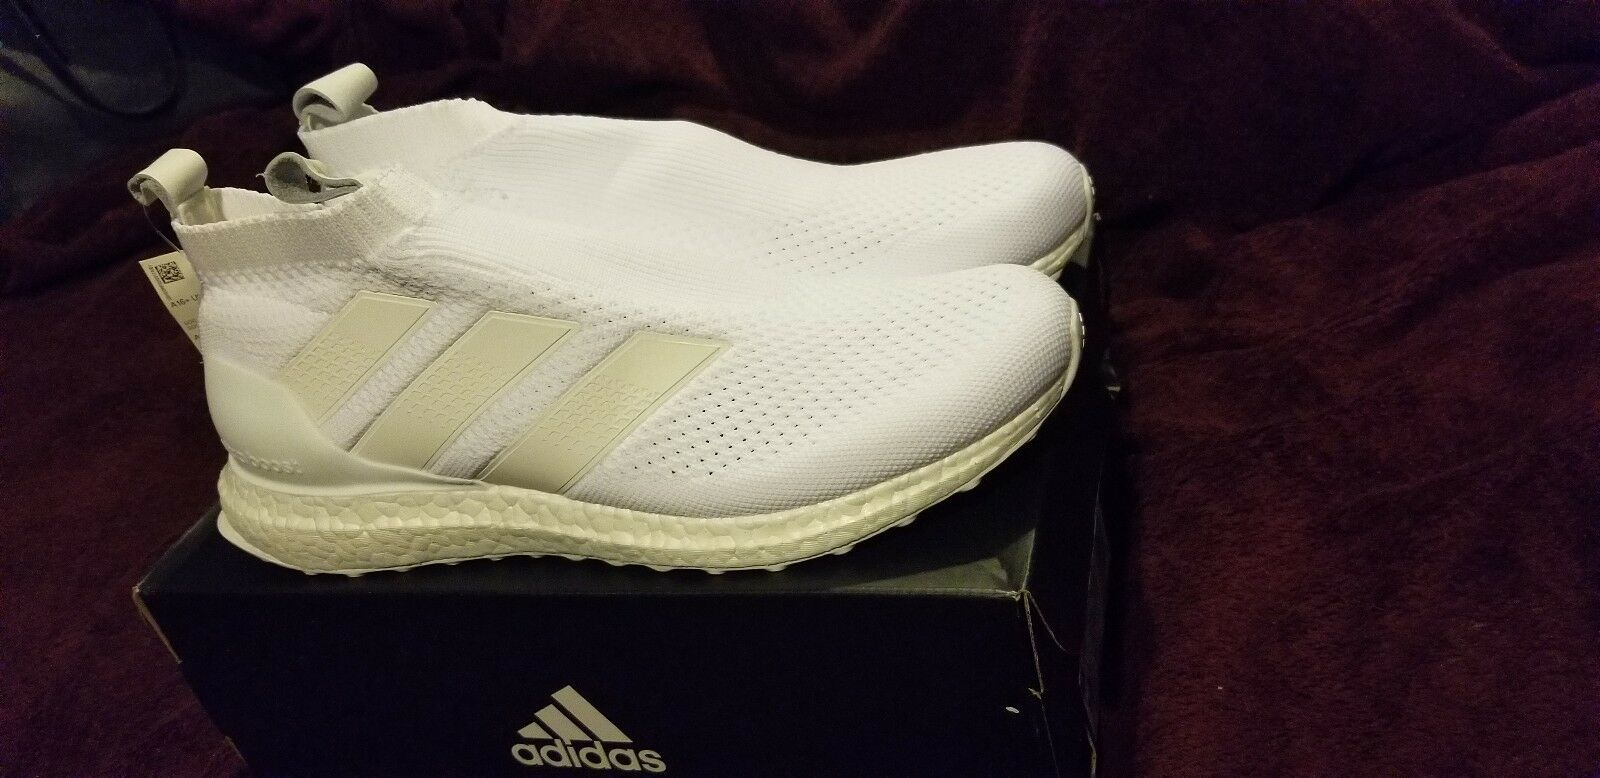 Adidas A16+ UltraBoost size 10.5